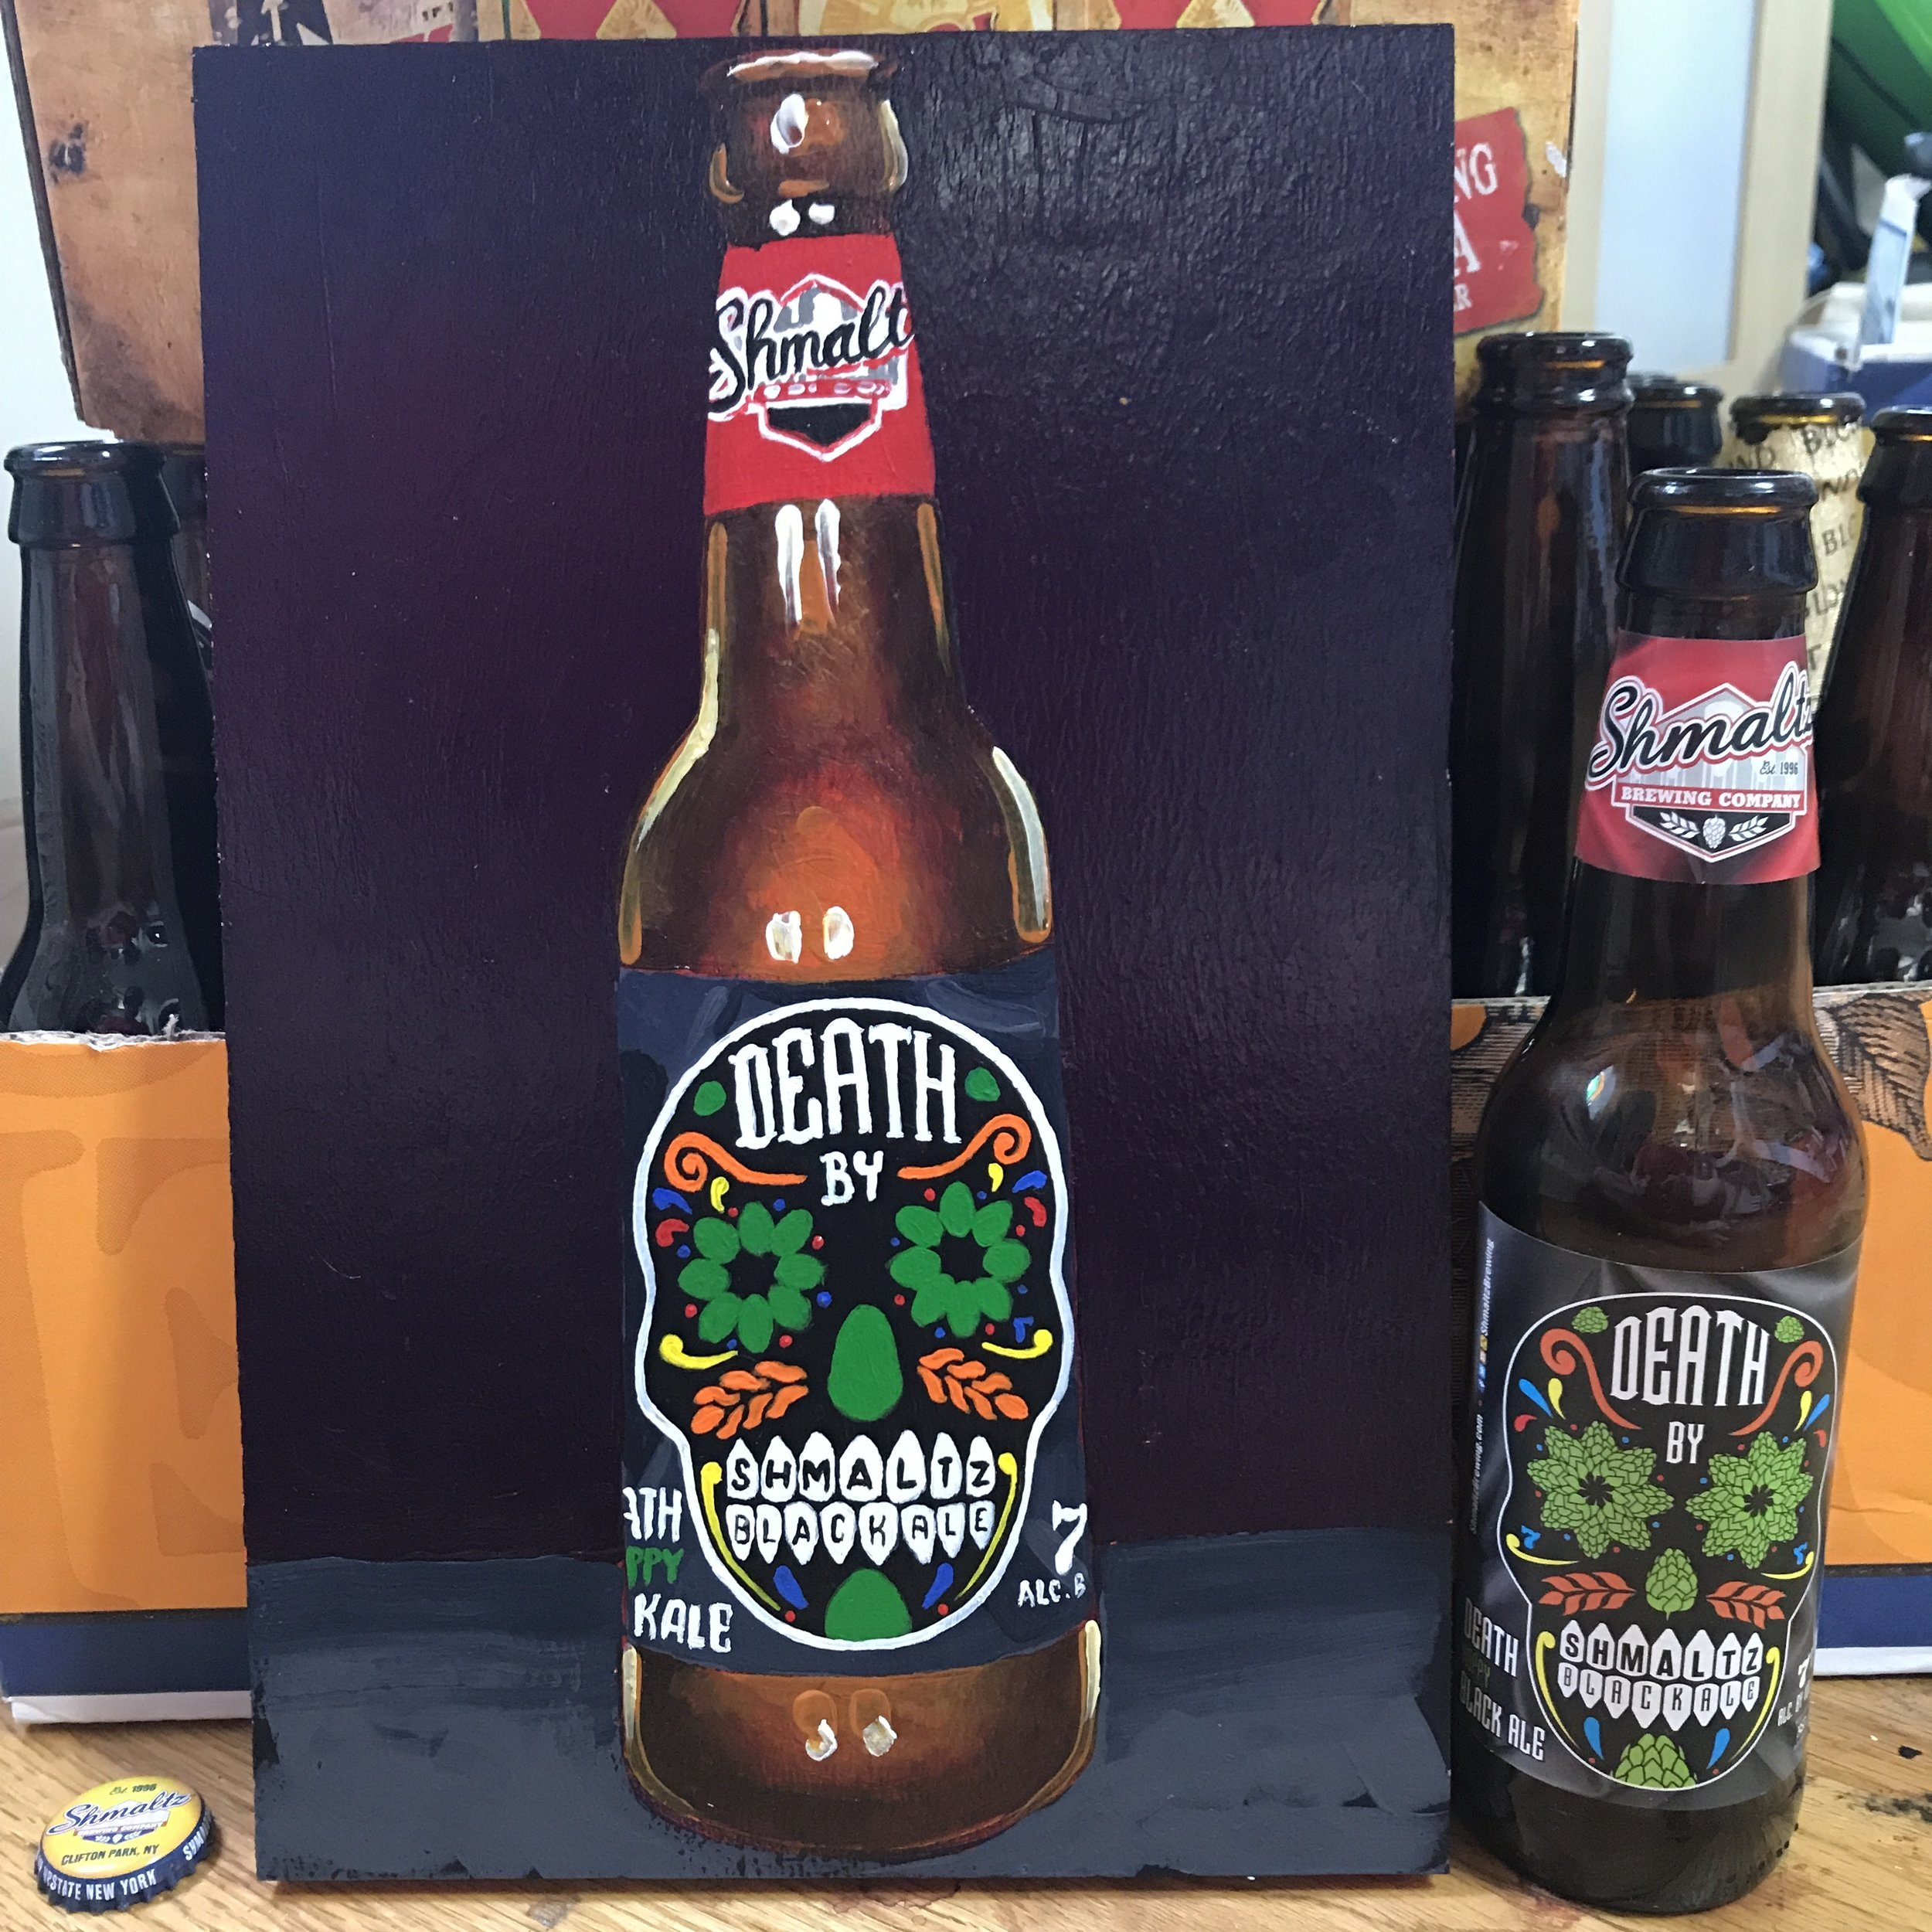 59 Schmaltz Death Hoppy Black Ale (USA)